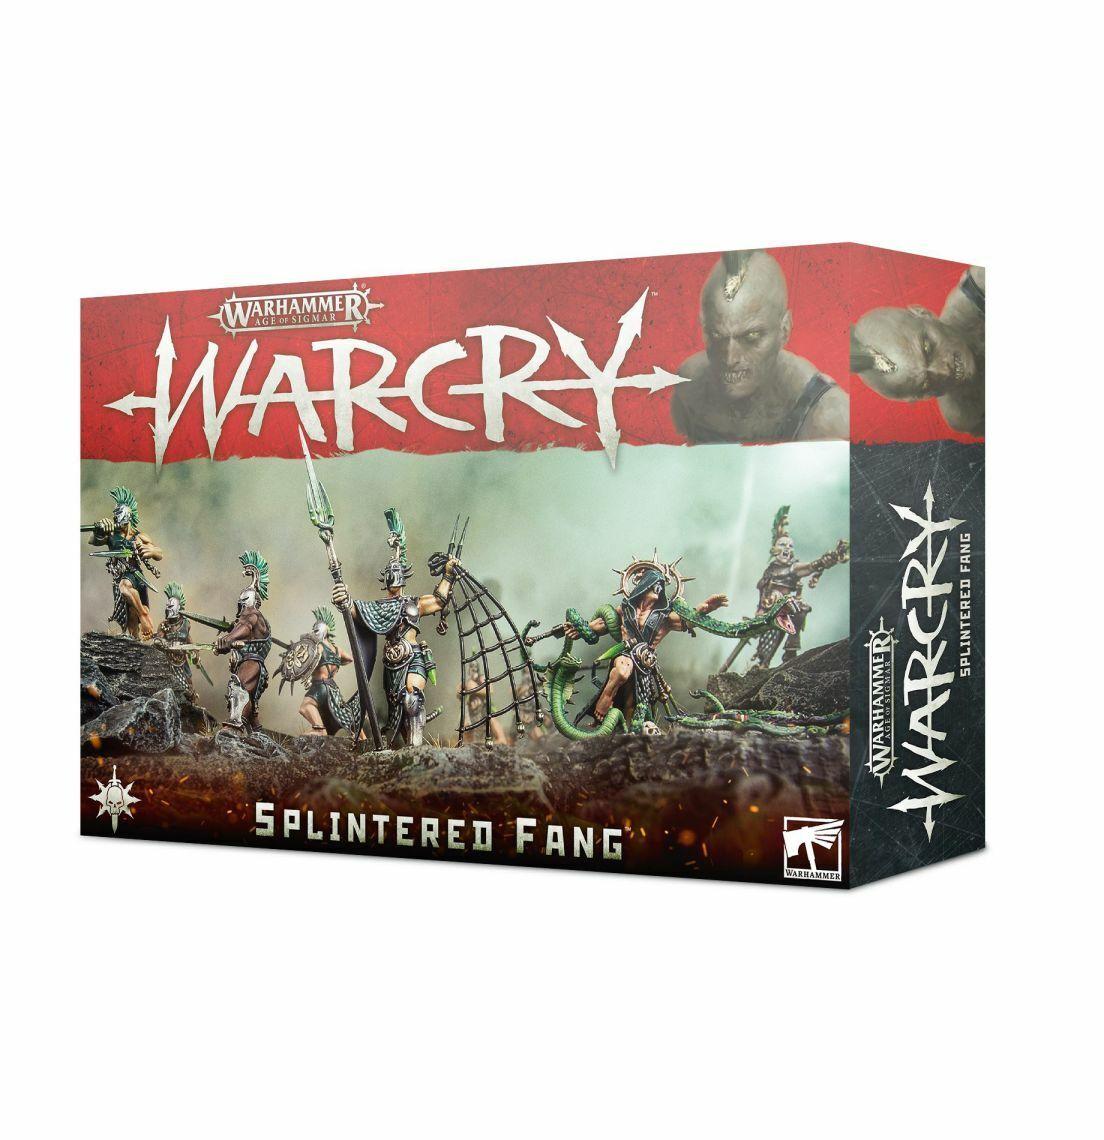 Warhammer Edad Of Sigmar Warcry The Splinterojo Fang Juegos Workshop Kriegerschar